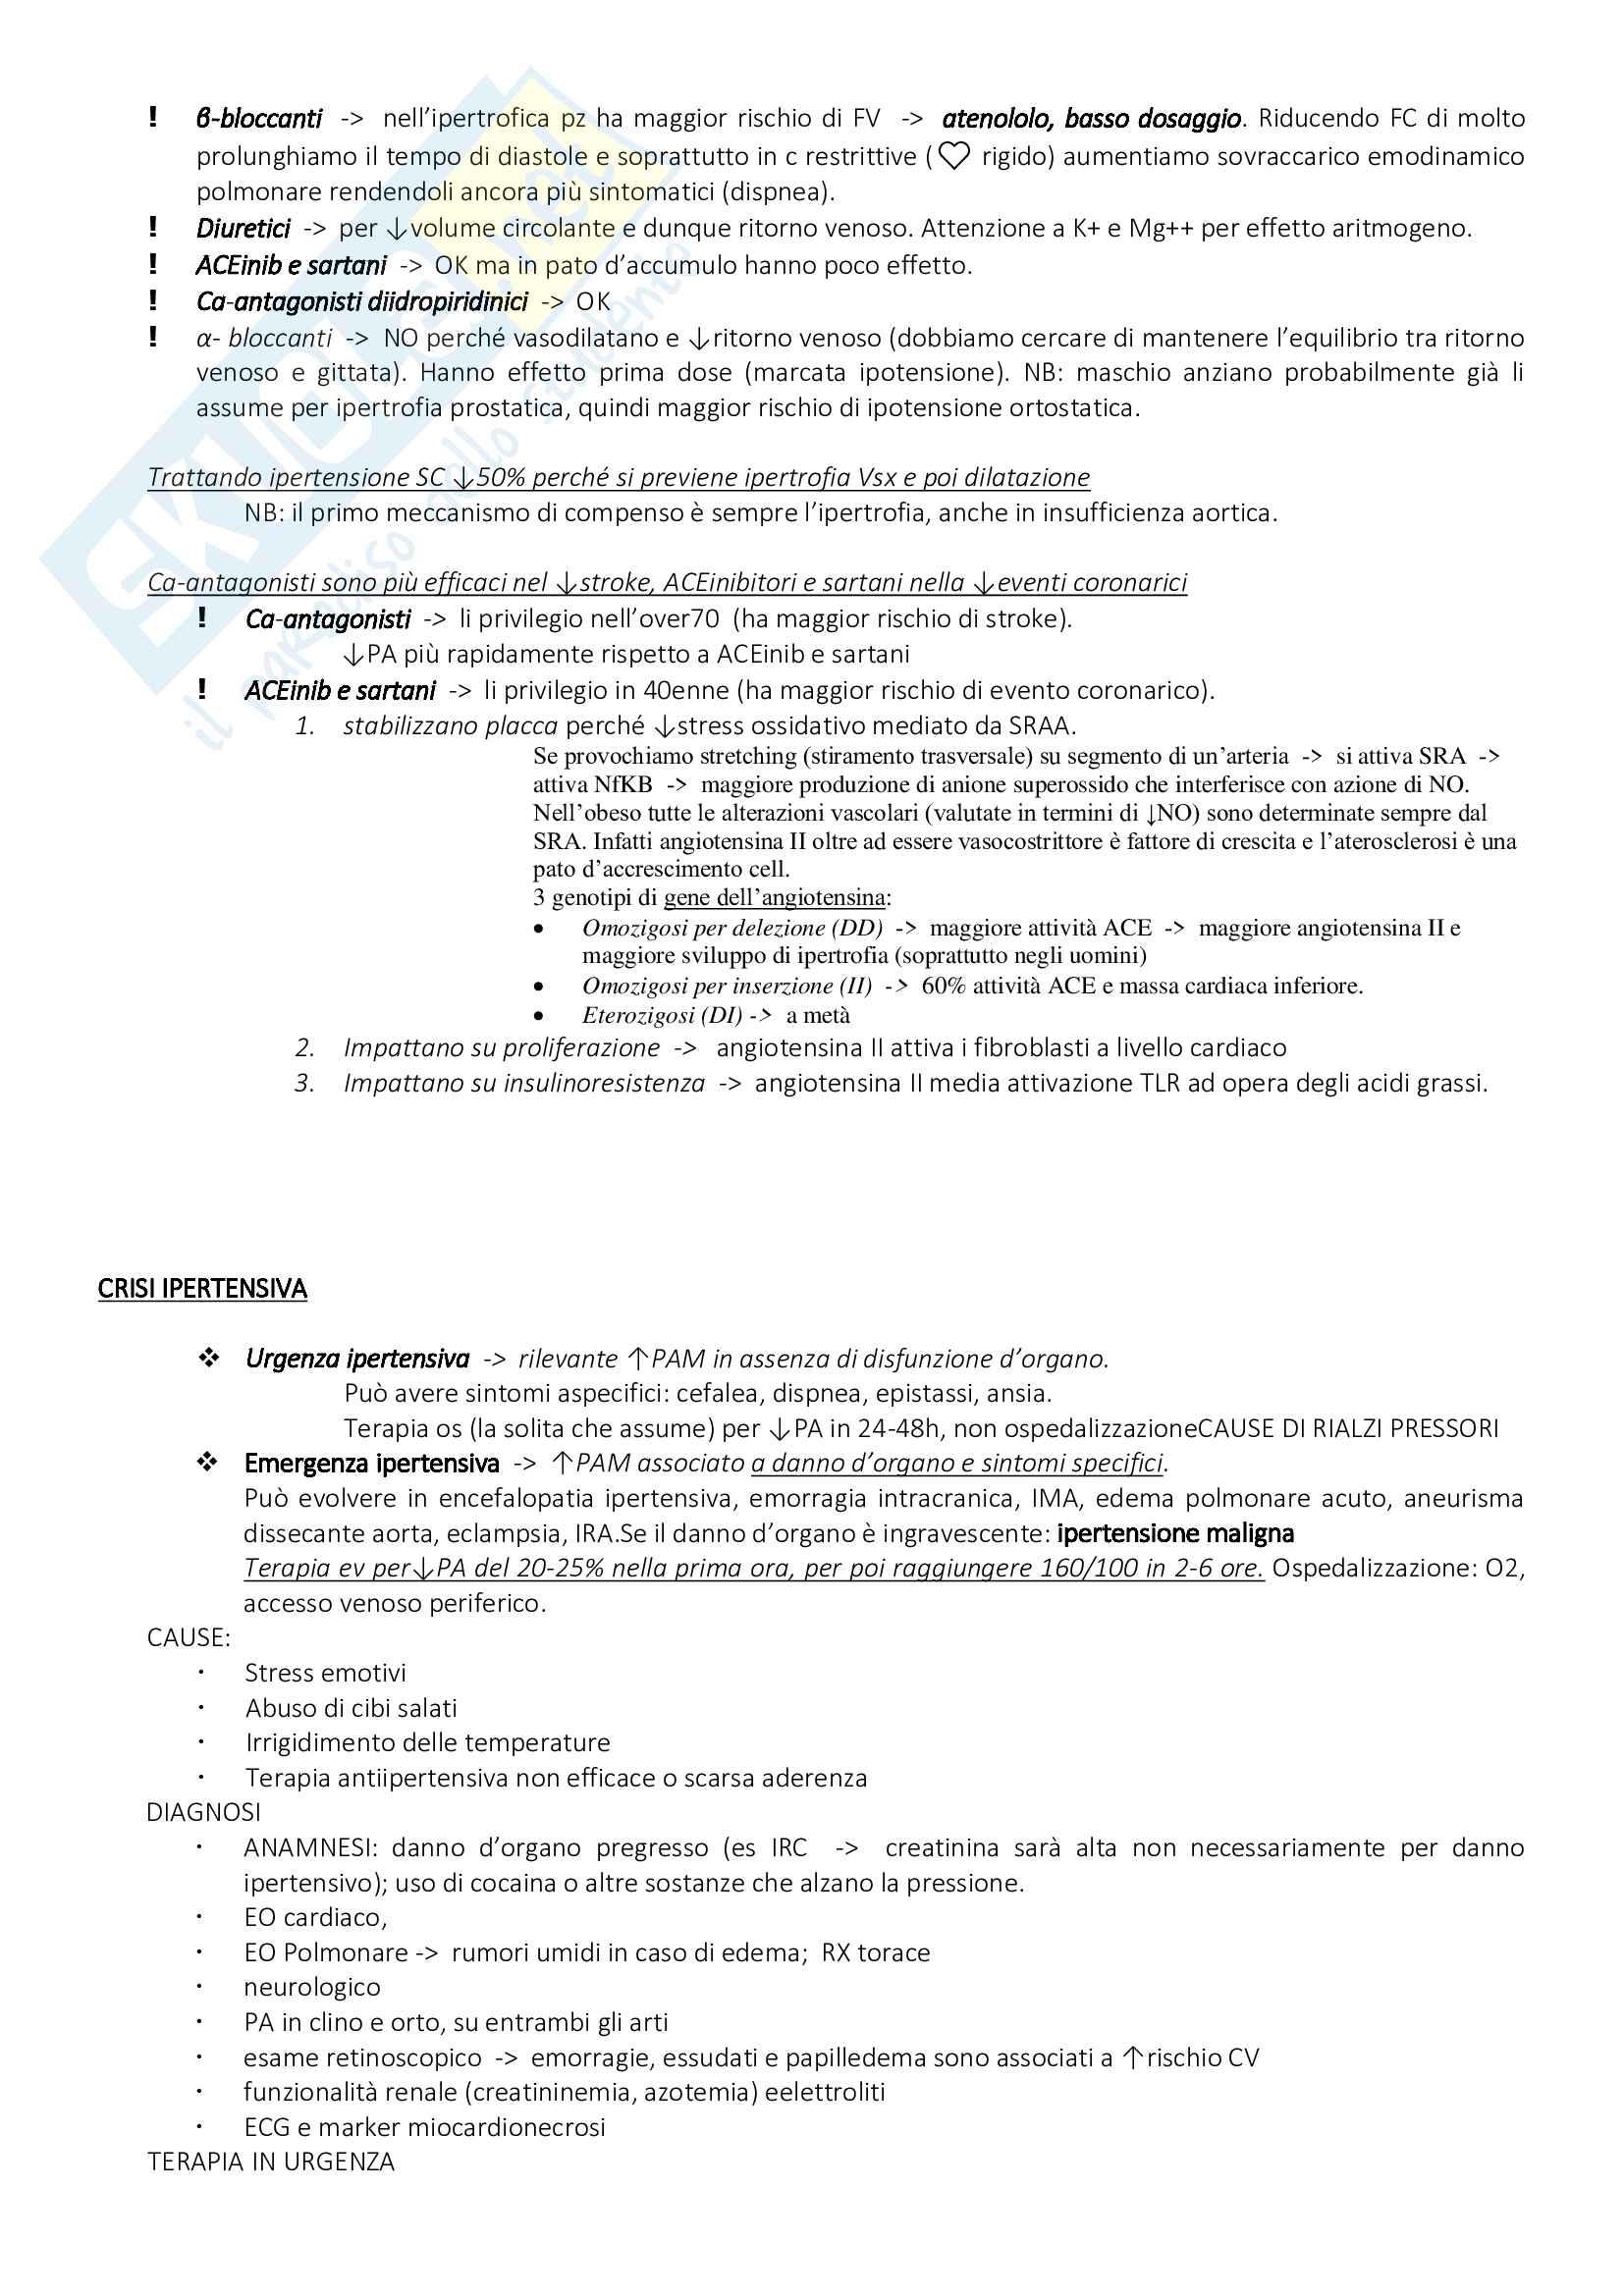 medicina interna, prof Perticone, Sciacqua, parte cardiologica Pag. 26